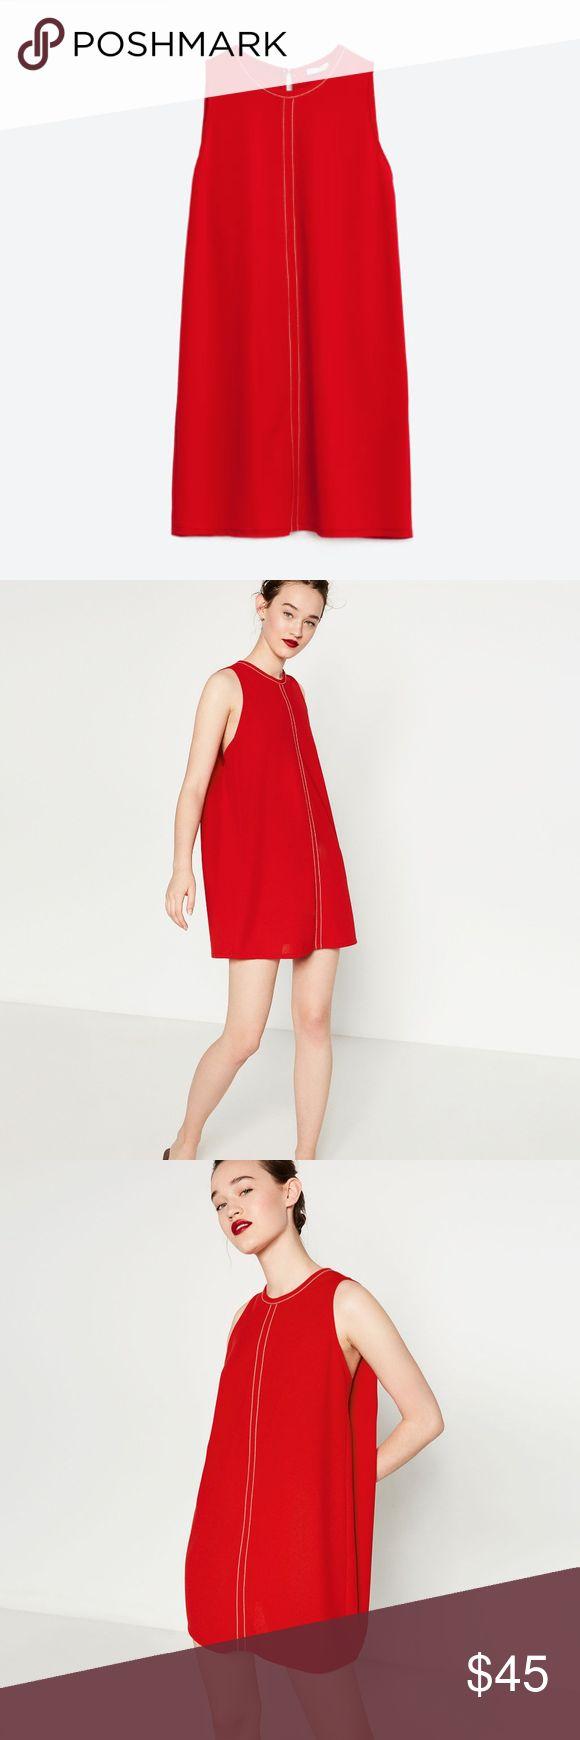 Zara Red Dress with Contrast Stitching Great condition. Beautiful dress. Zara Dresses Mini